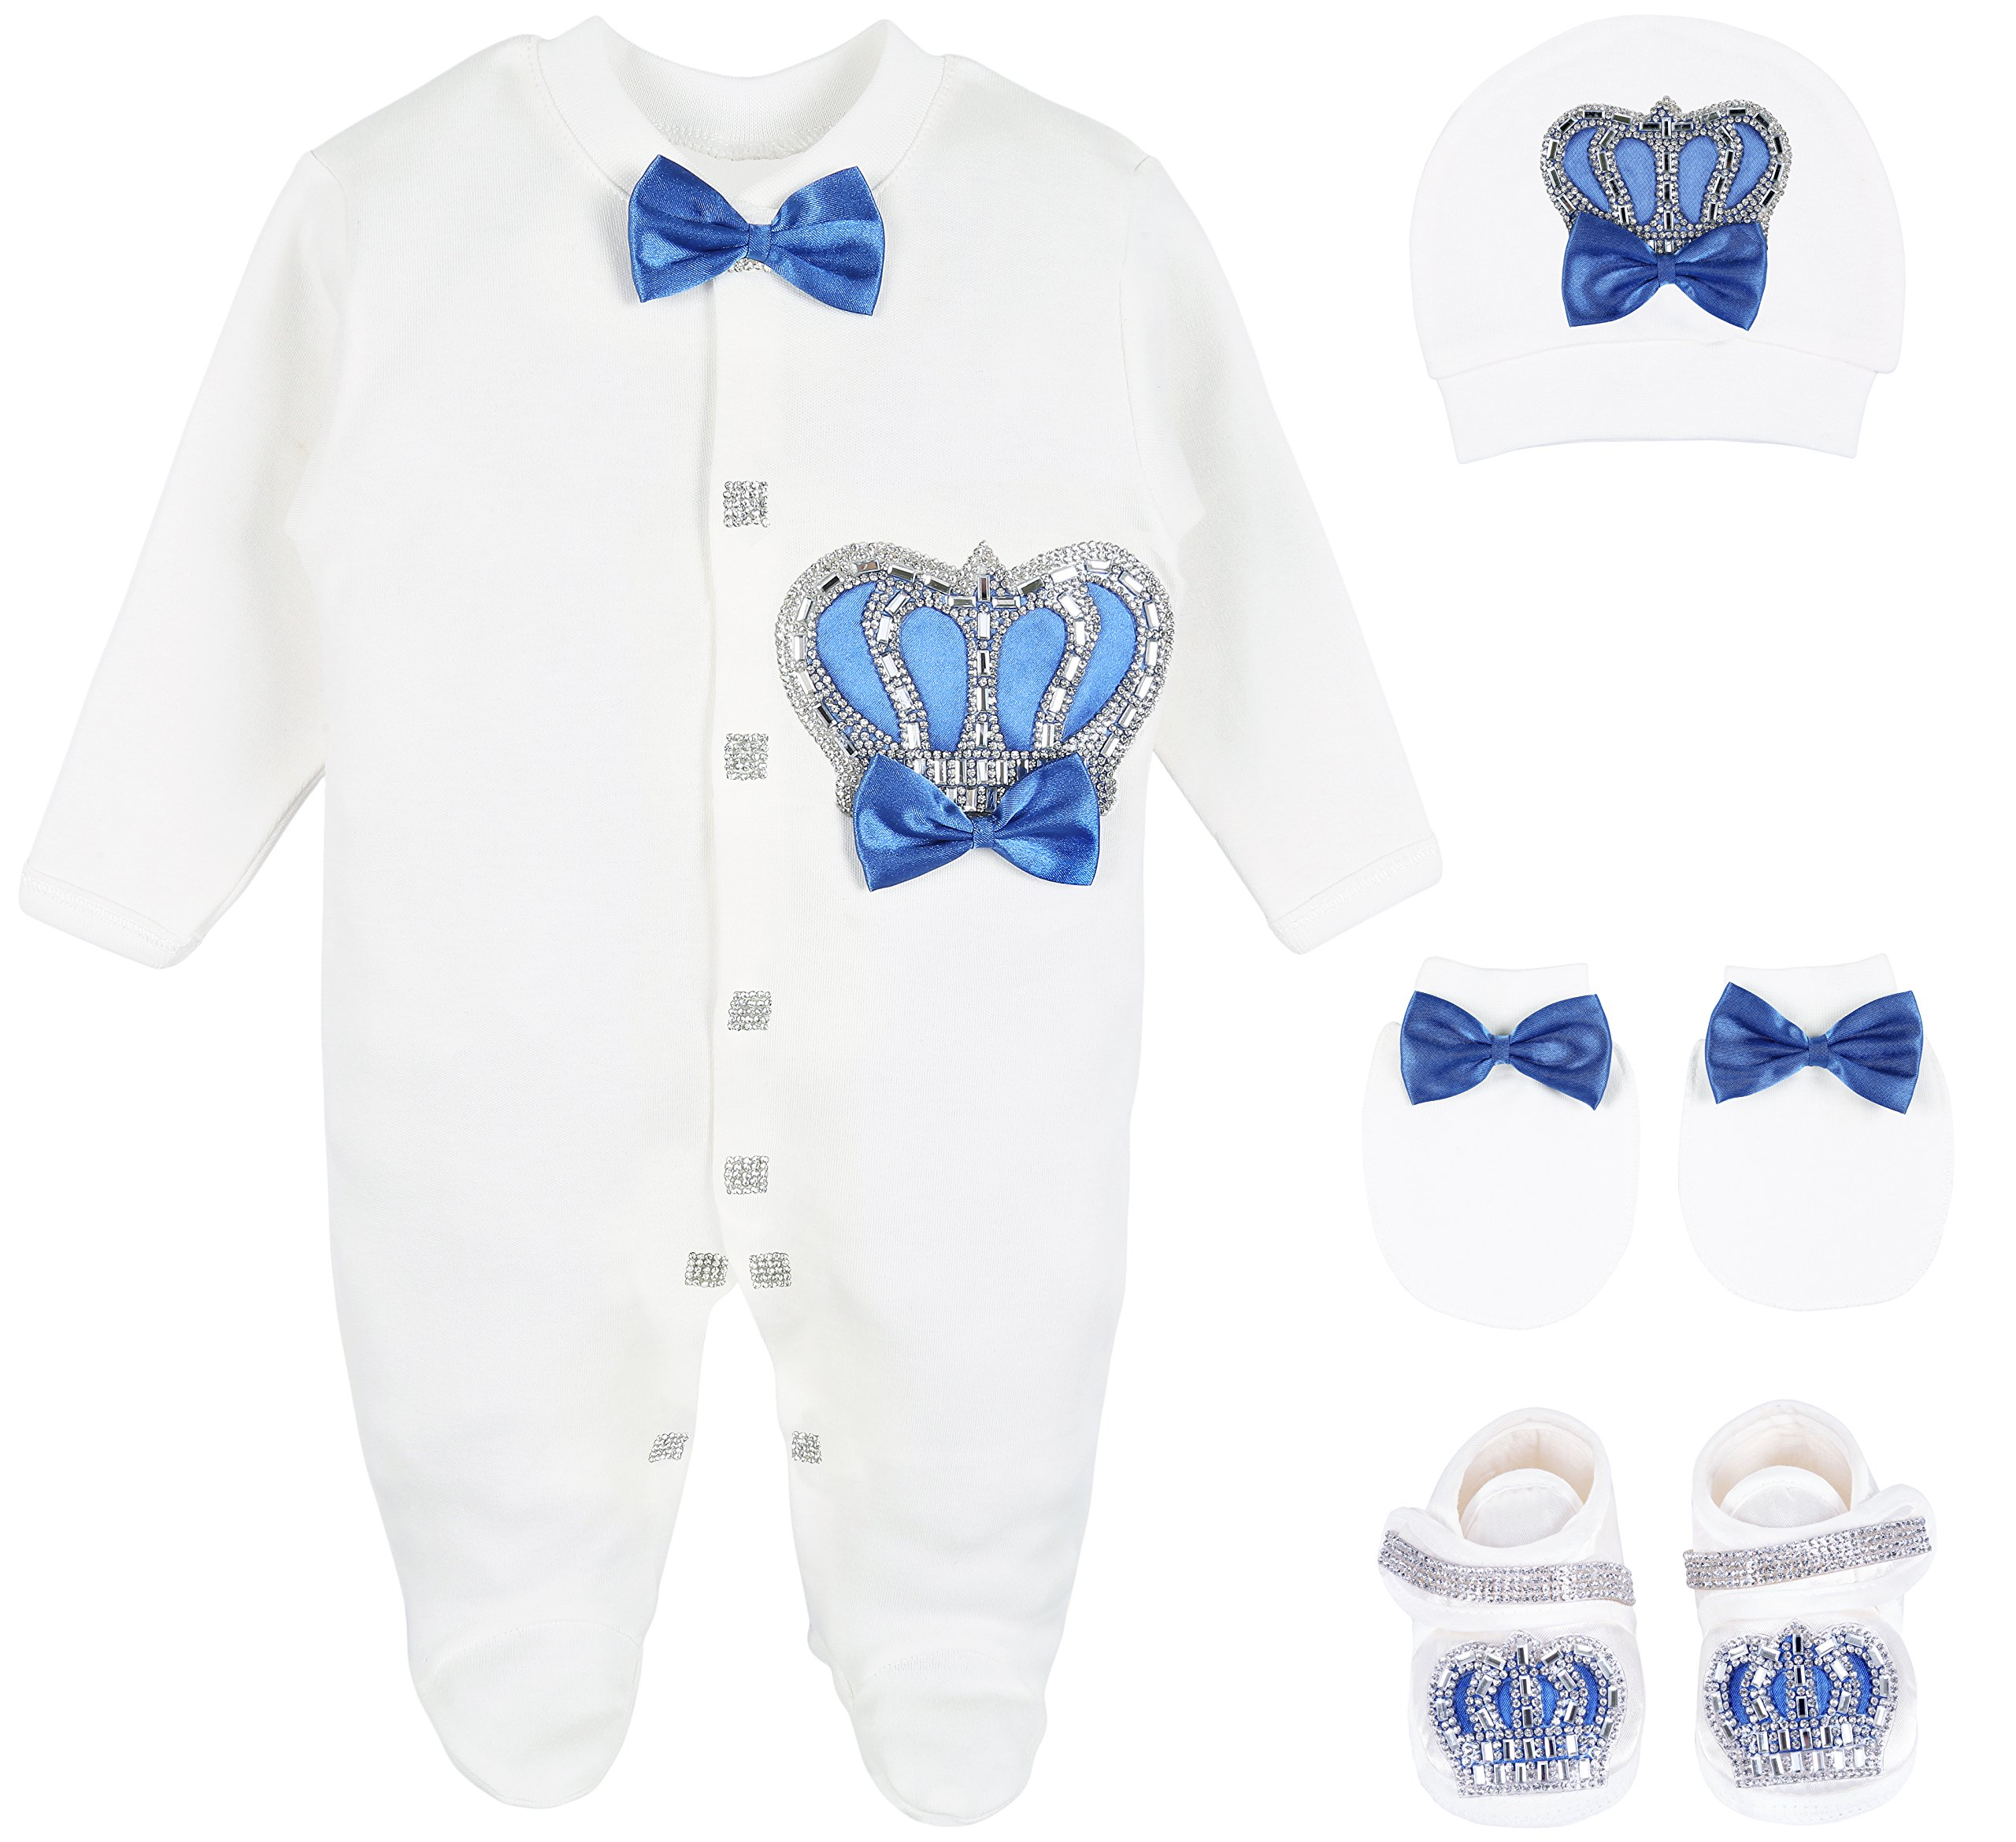 Lilax Baby Boy Newborn Crown Jewels Layette 4 Piece Gift Set 0-3 Months Royal Blue 0-3M by Lilax